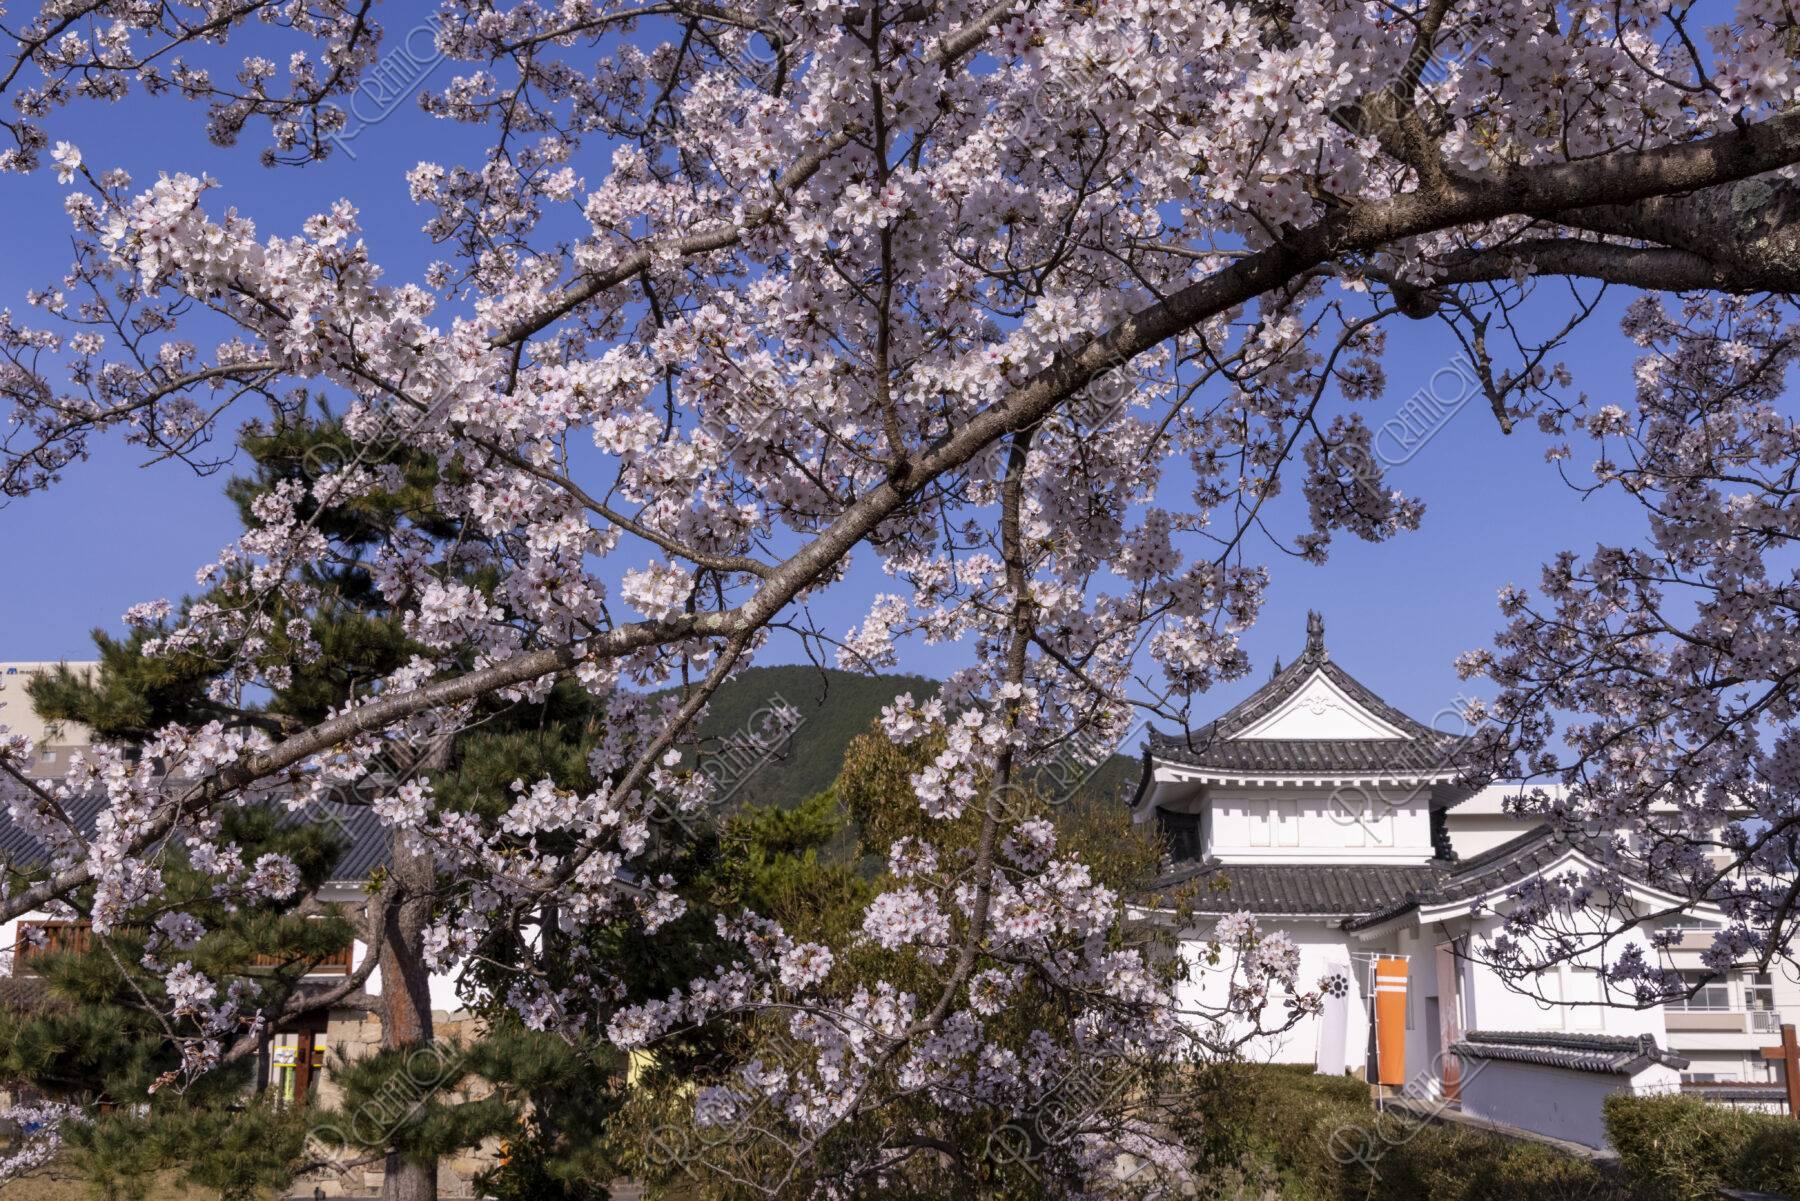 舞鶴田辺城跡の桜